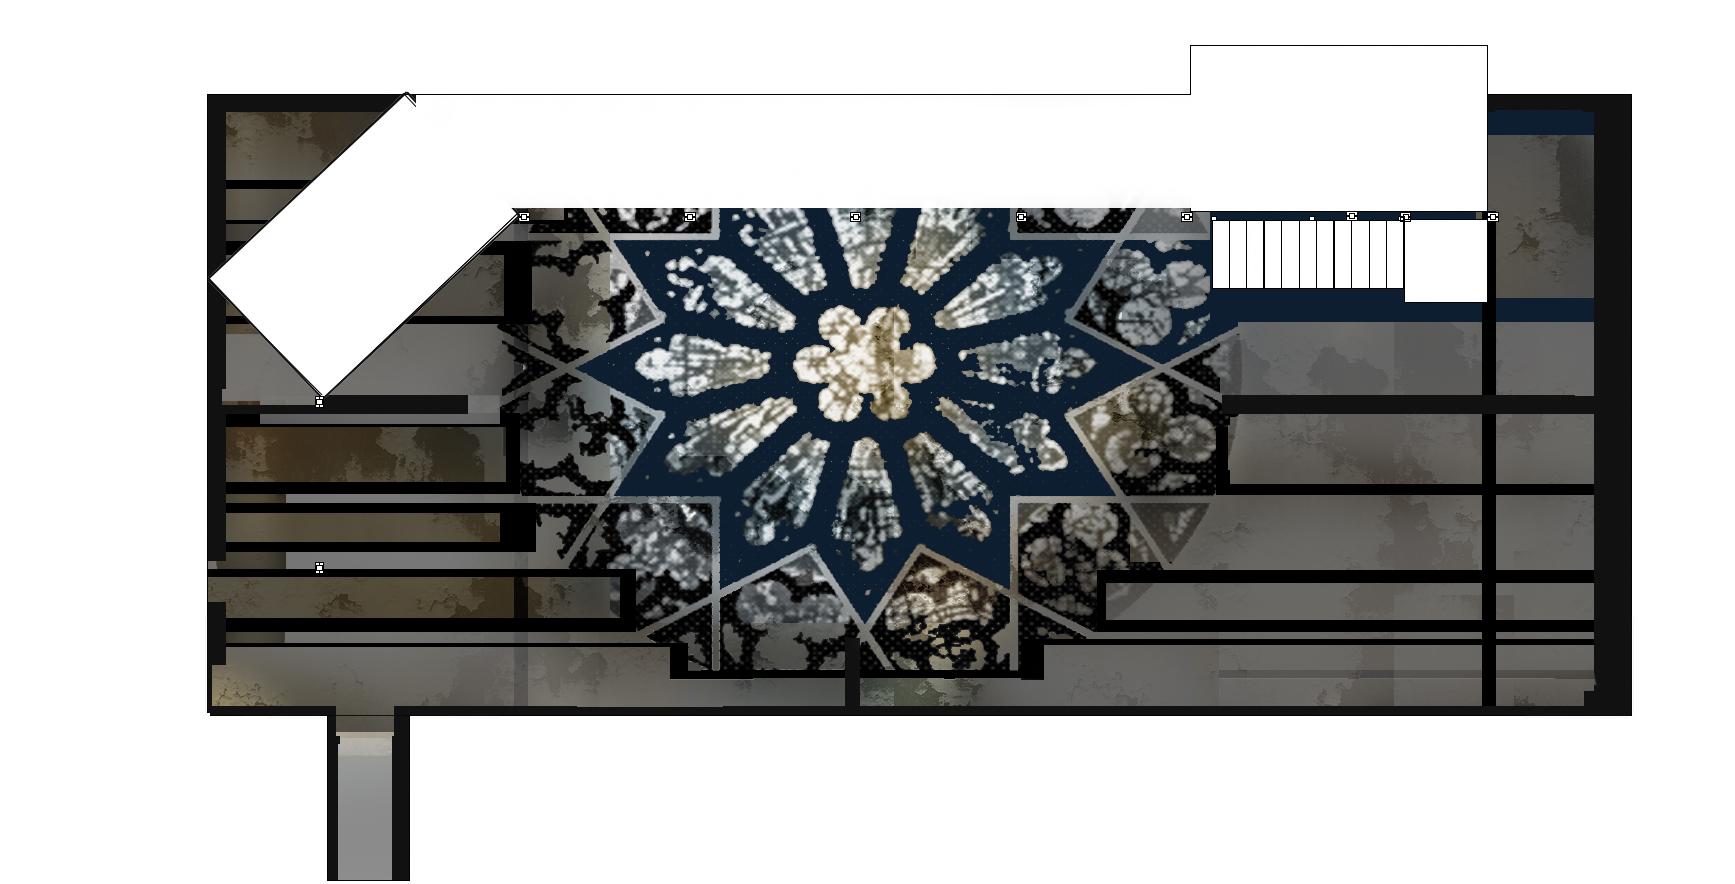 Floor concept(photoshopped rendering)